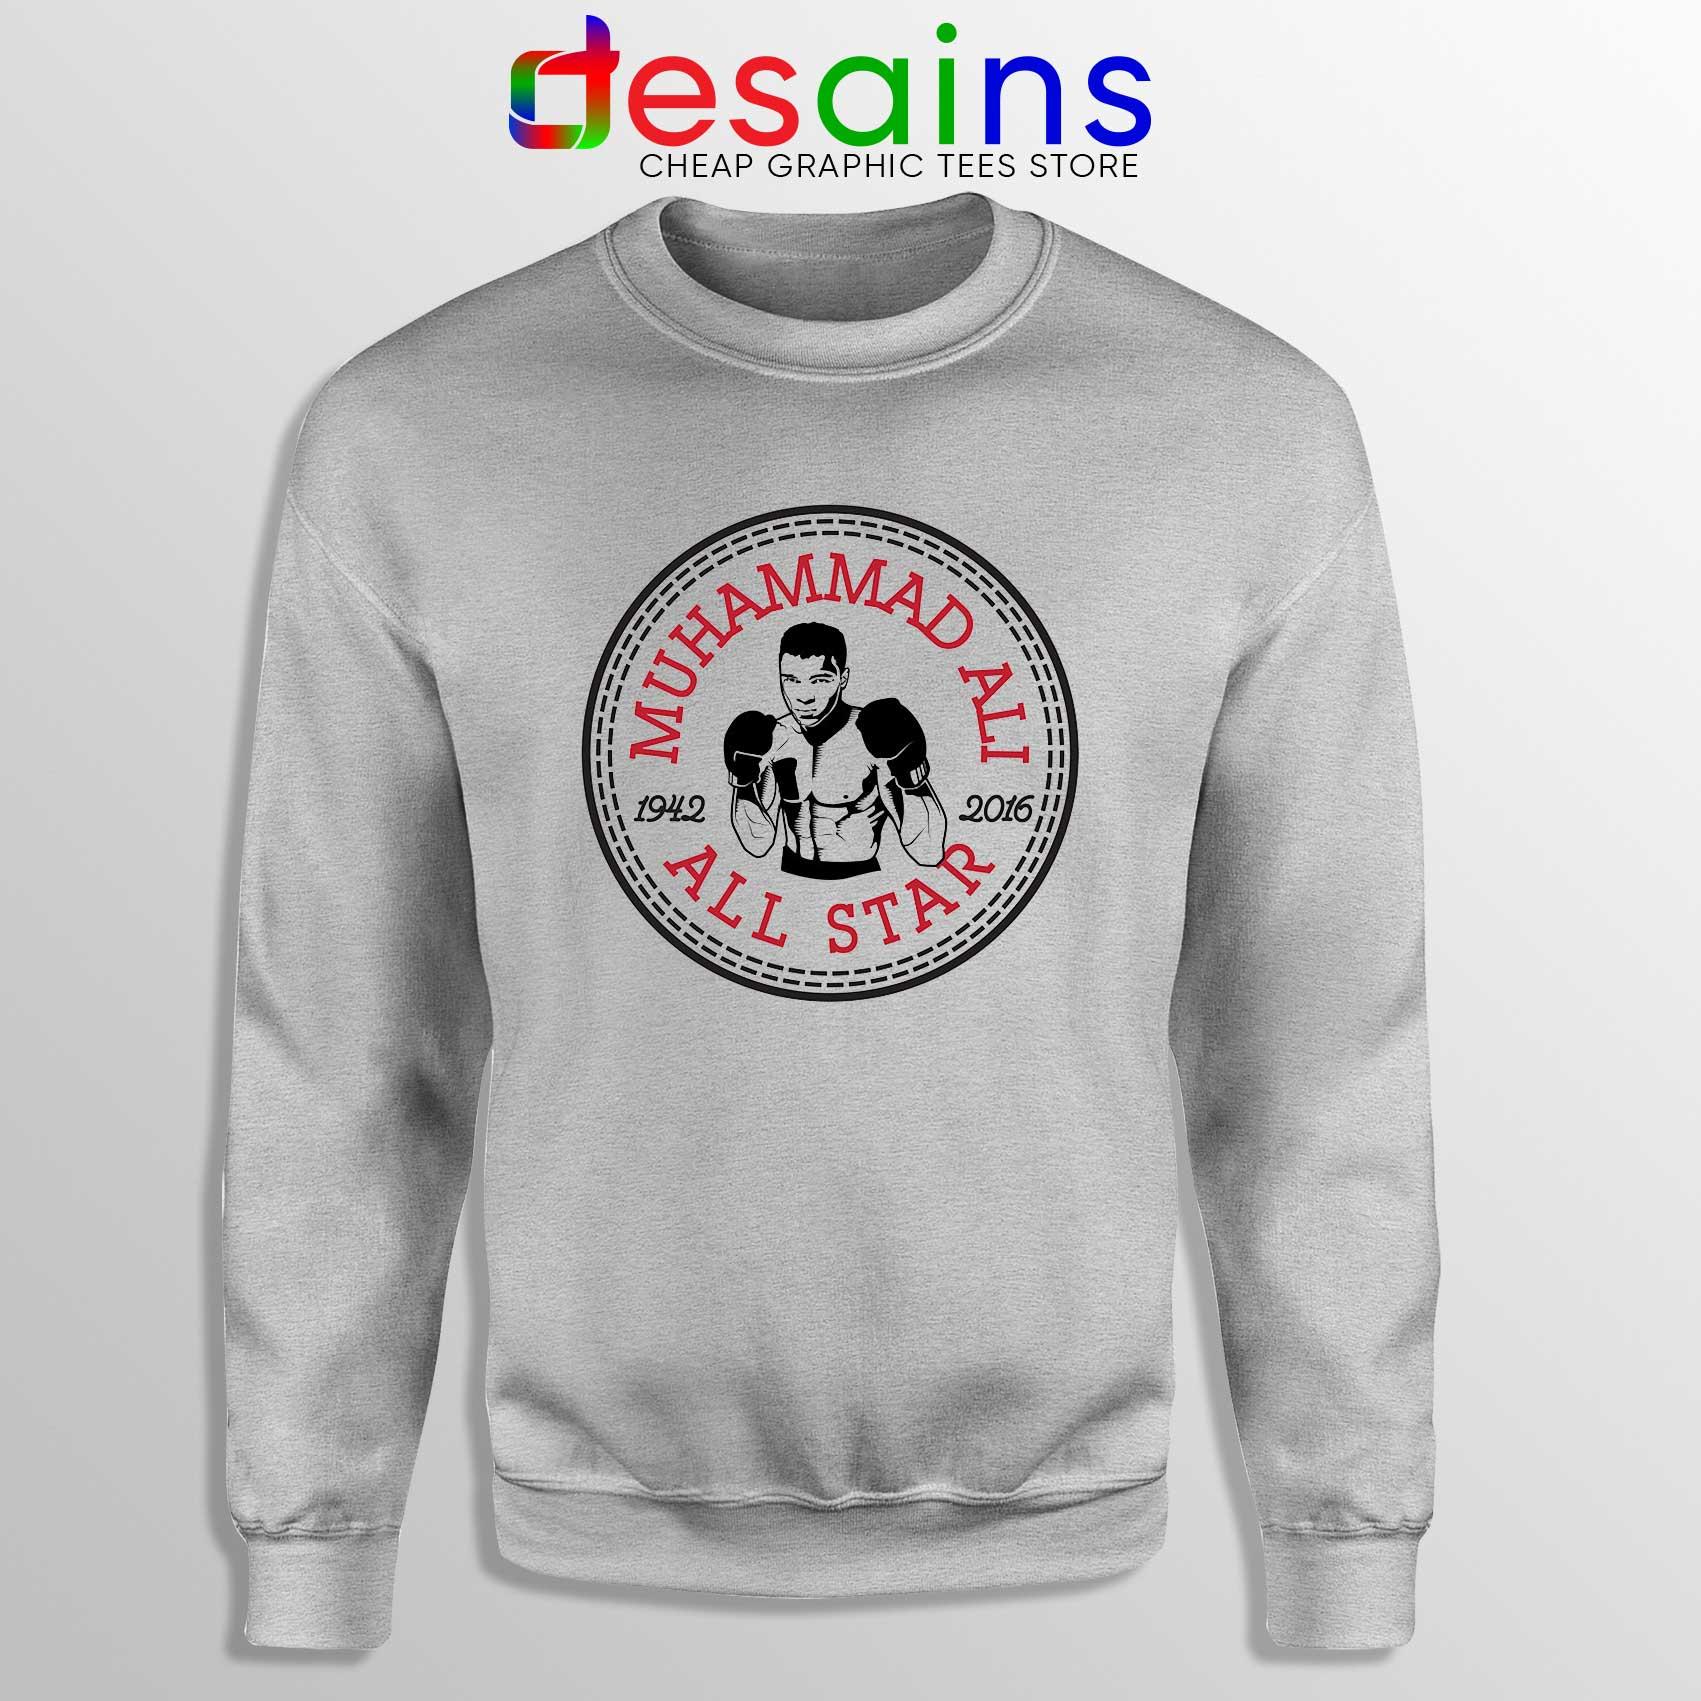 41aa9a0b73ef Muhammad Ali All Star Sweatshirt Converse Logo Crewneck Size S-3XL